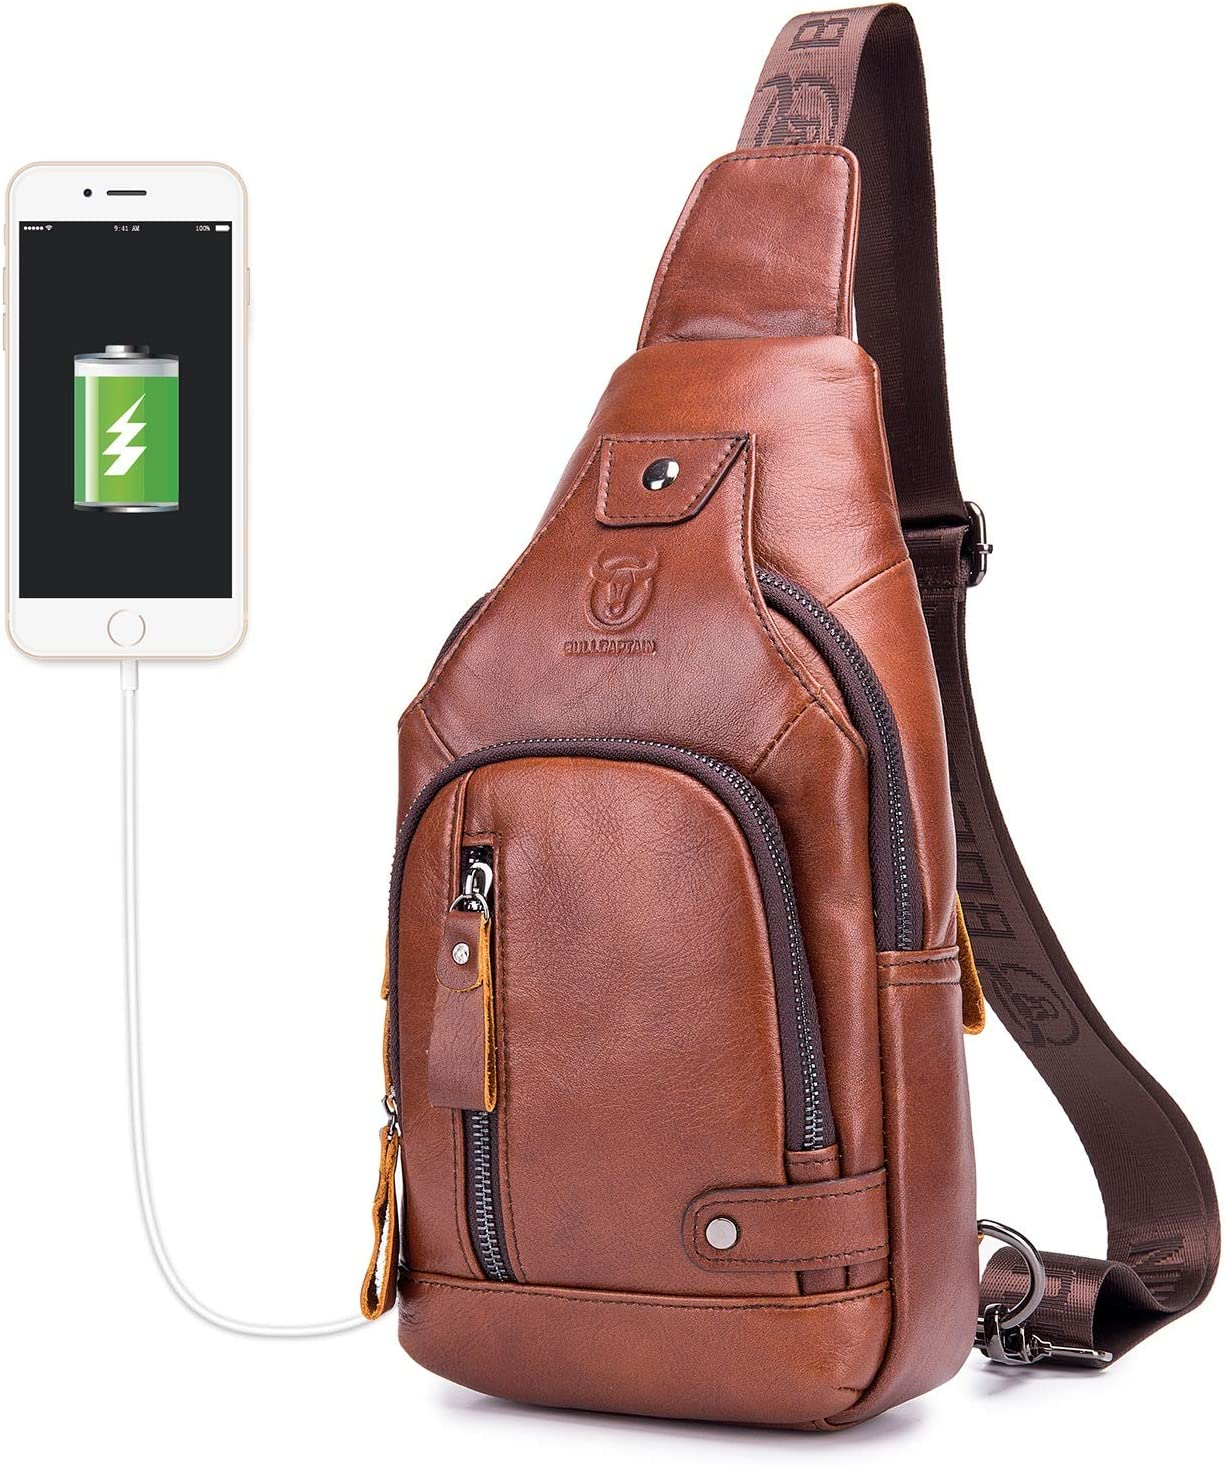 BULLCAPTAIN Genuine 新品未使用正規品 Leather Mens Sling Bag Travel C 定番スタイル Multipurpose